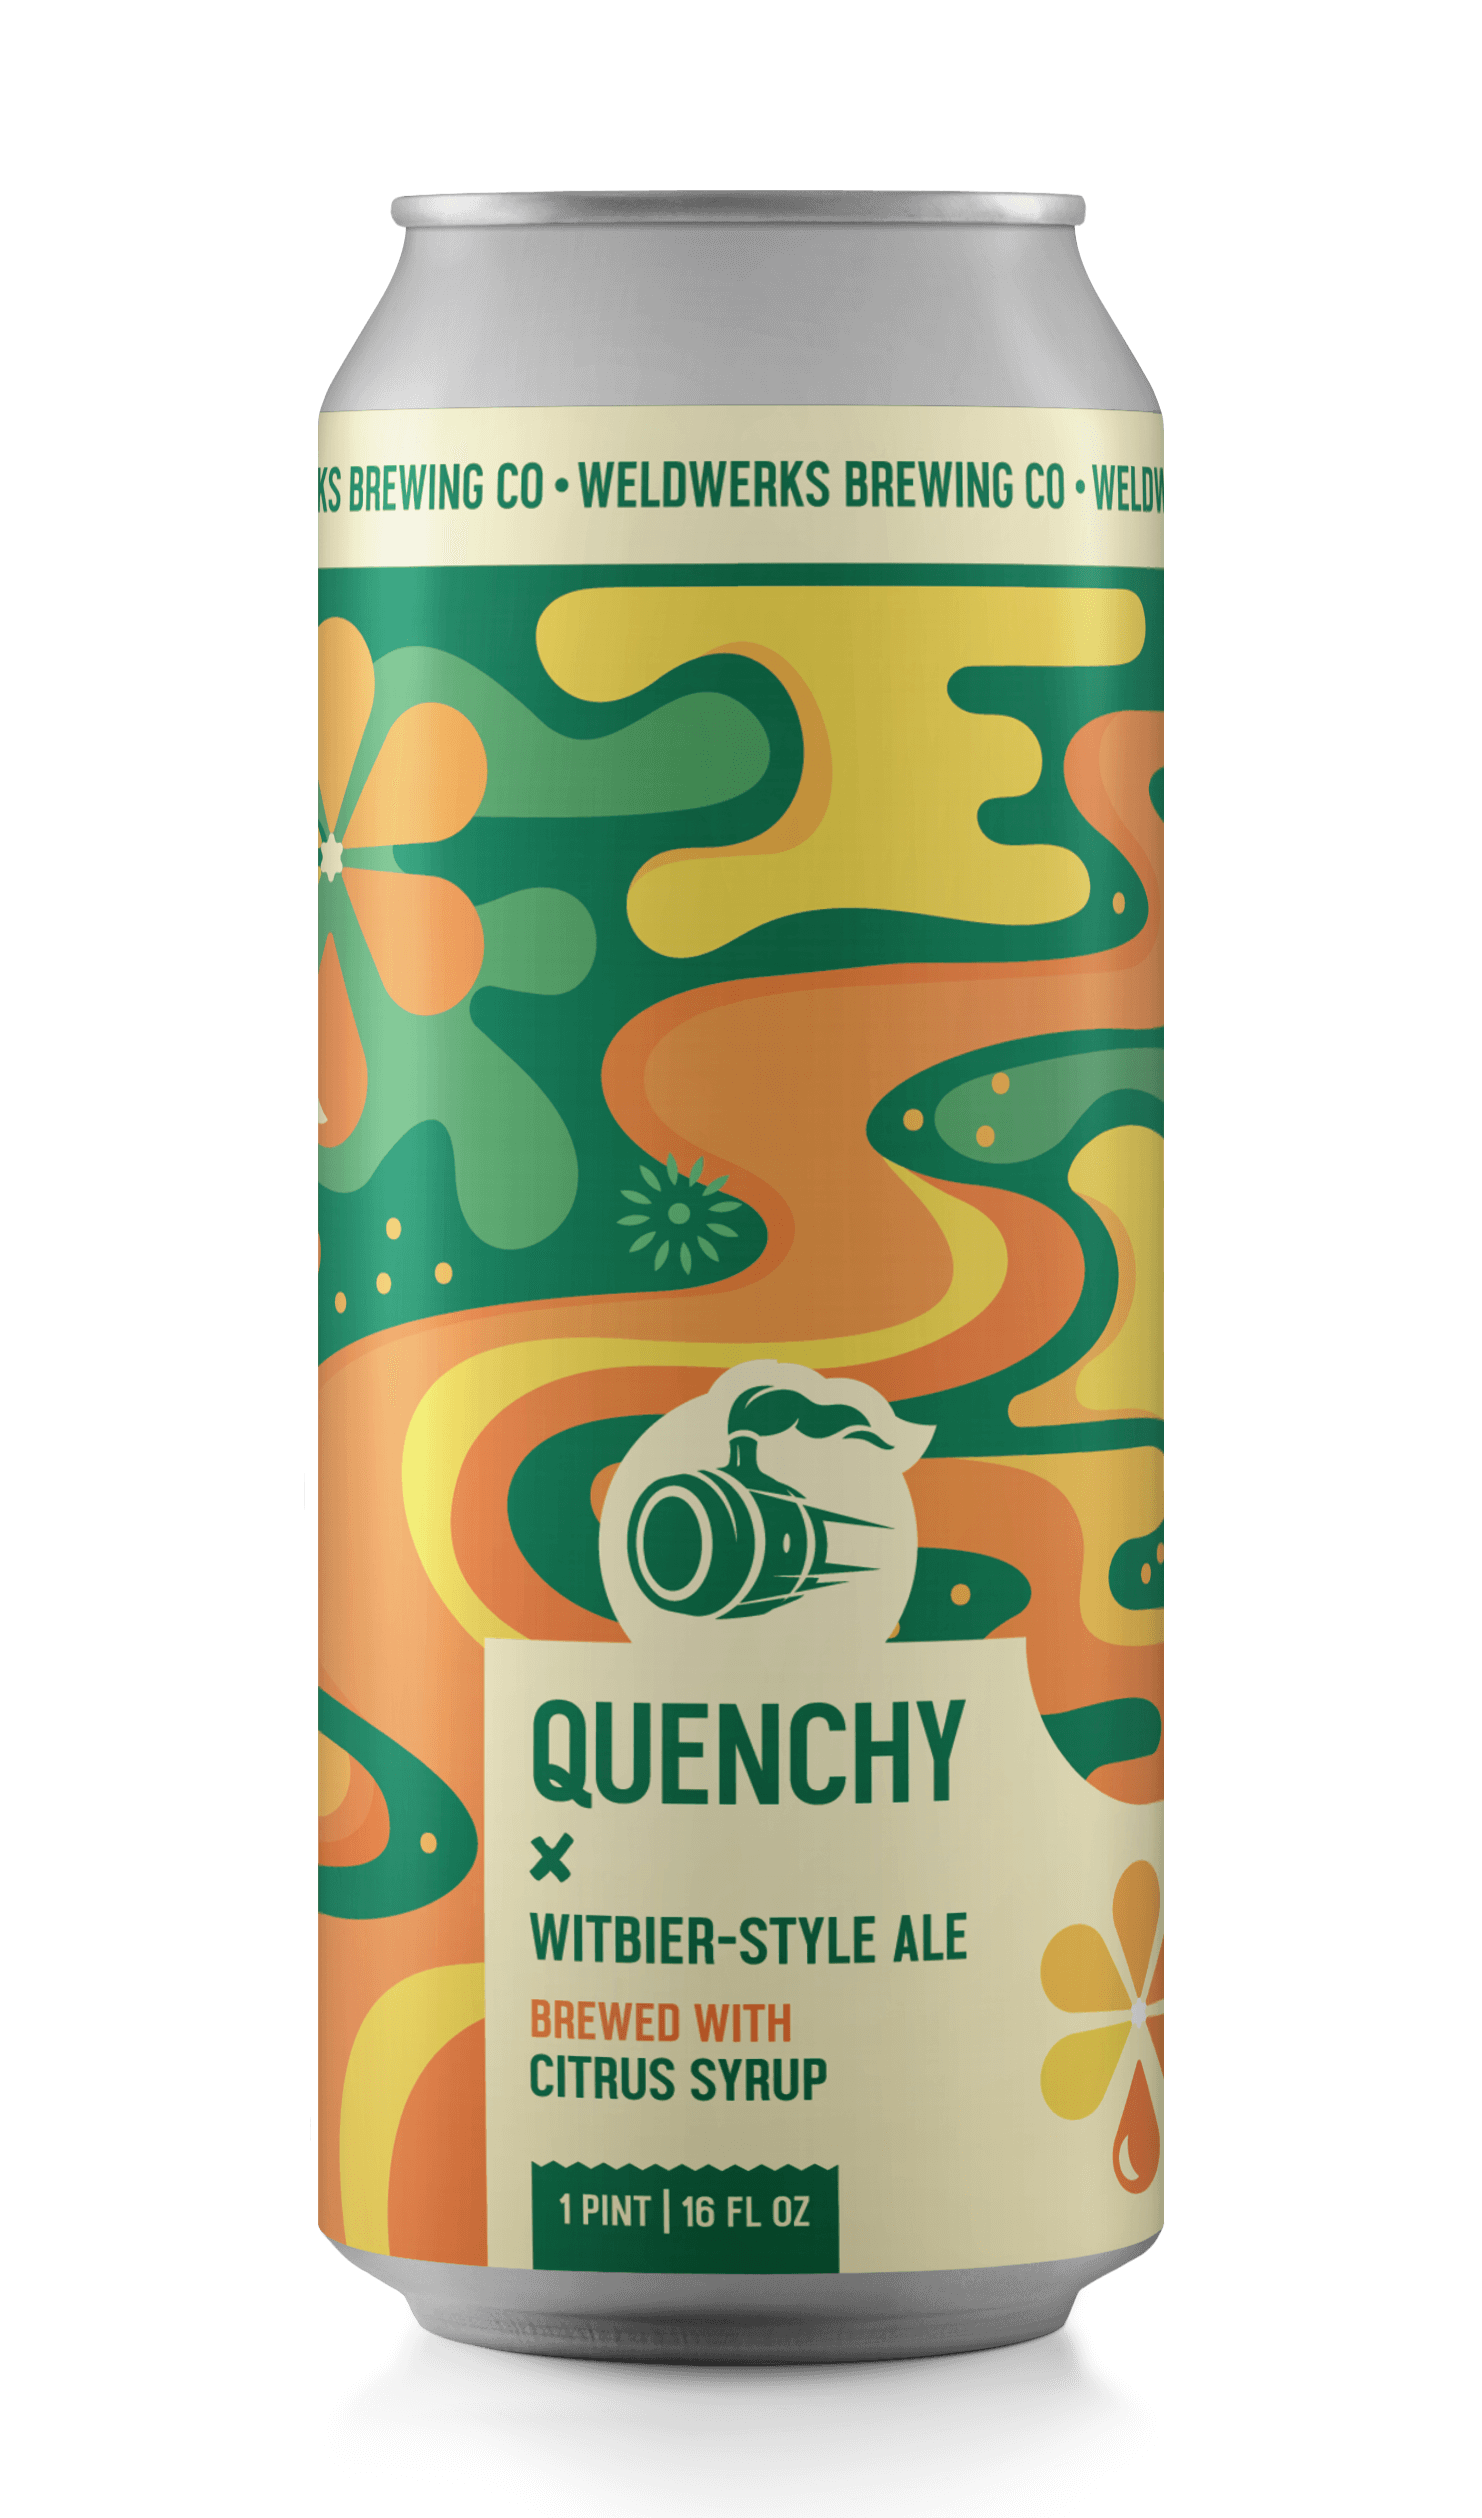 Quenchy